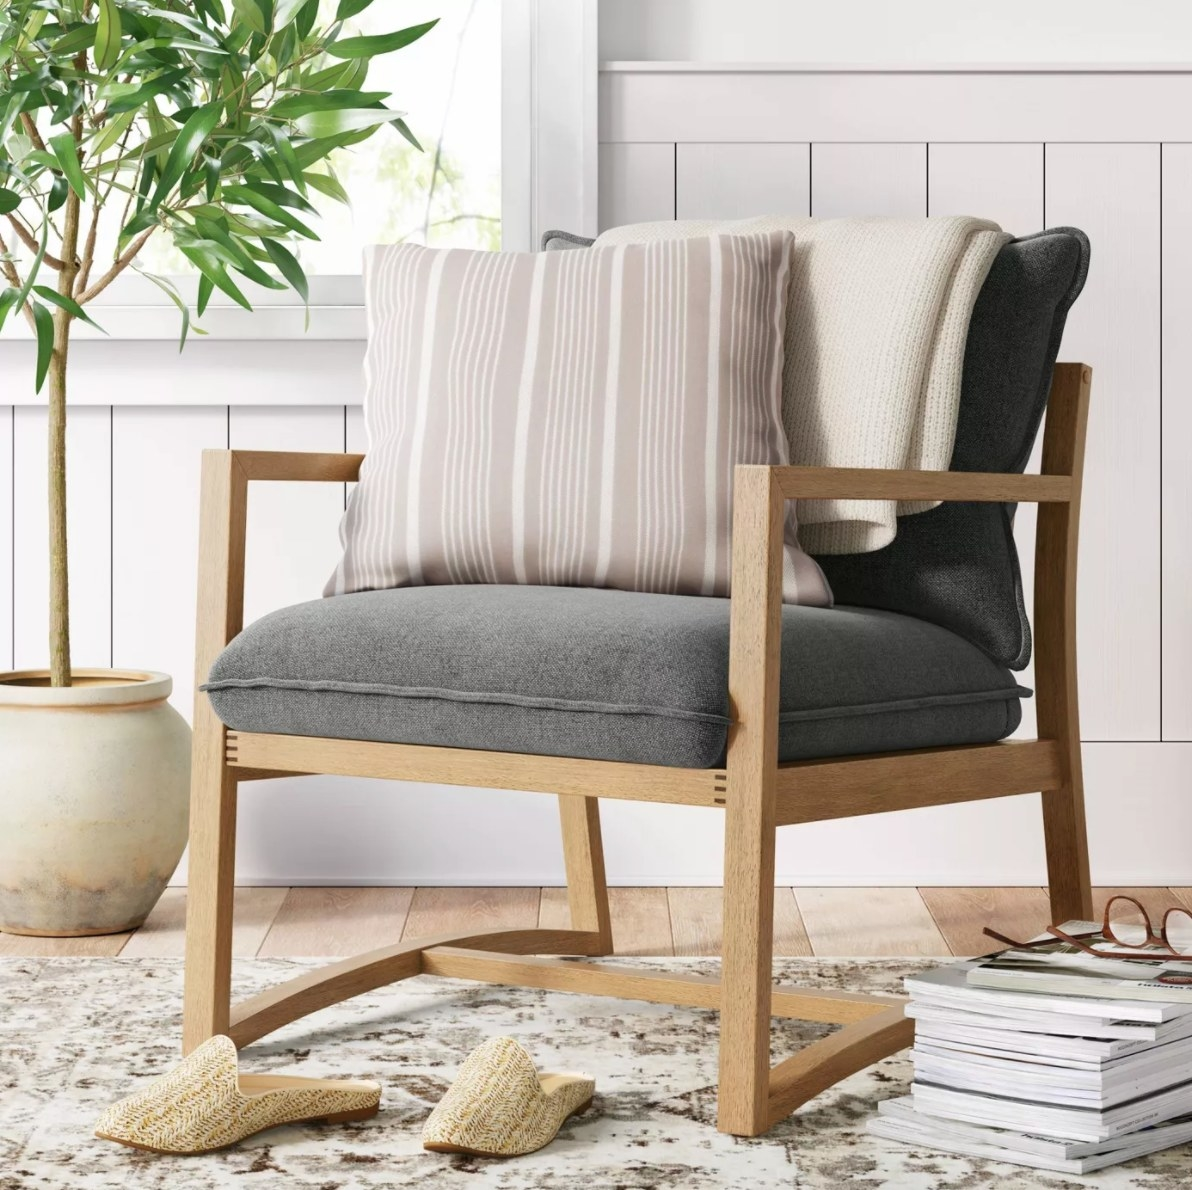 The sling armchair in dark grey